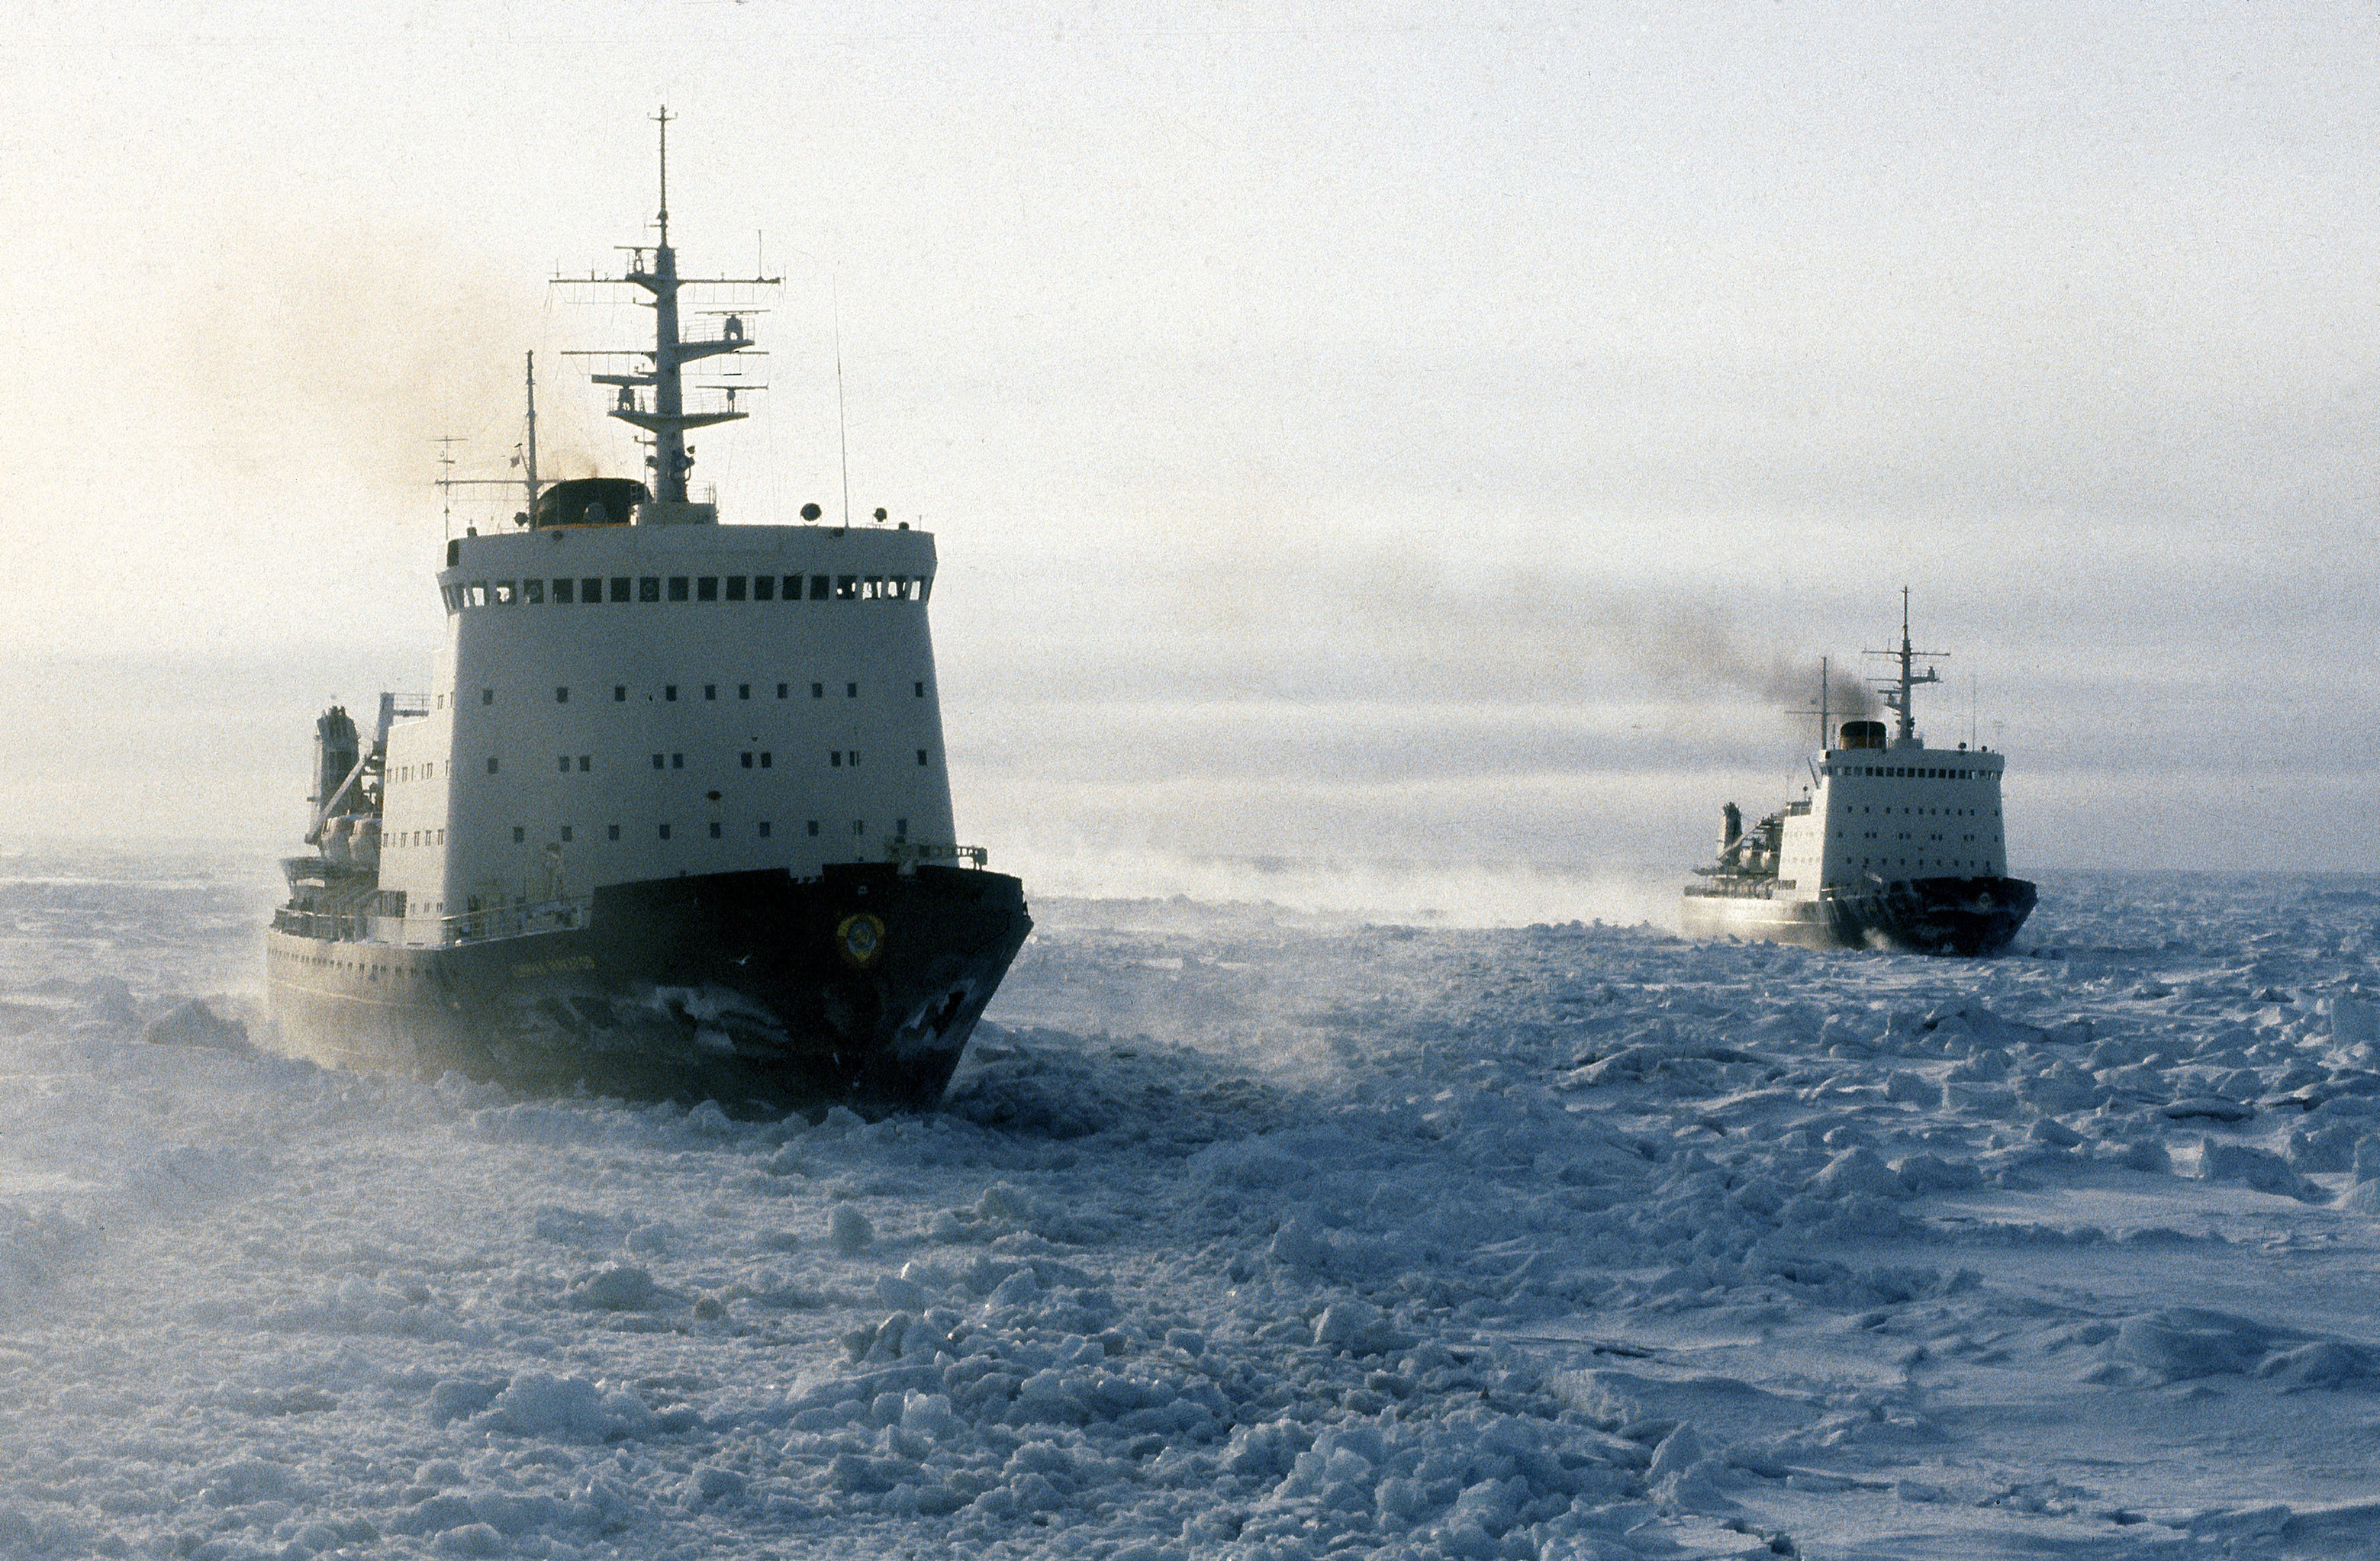 Soviet ice-breakers in the Chukchee Sea, the Arctic Ocean